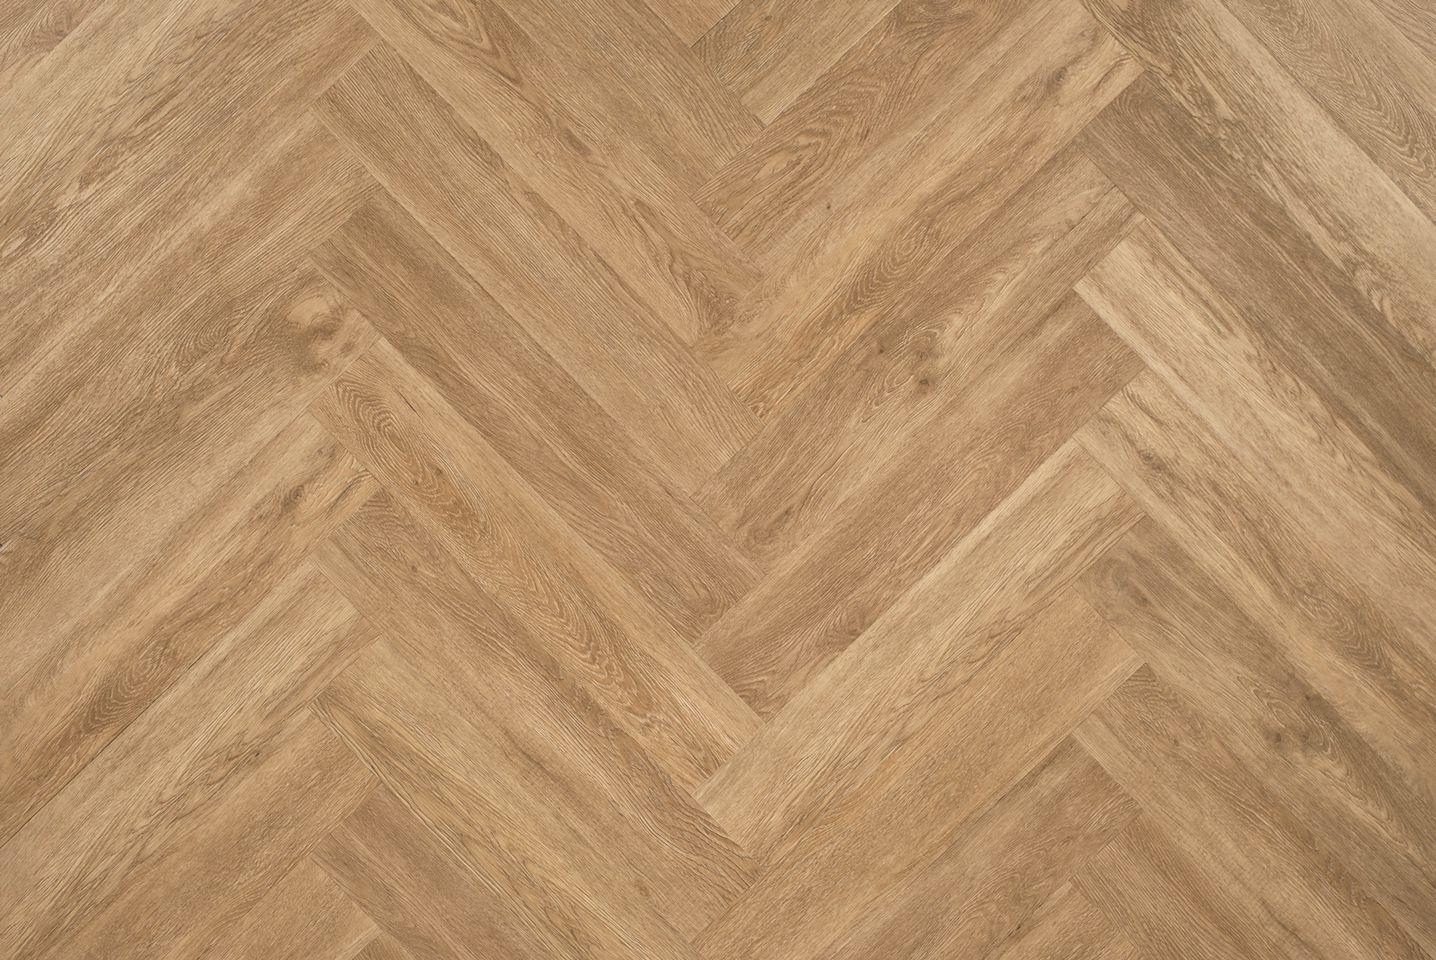 Eiken Pvc Vloer : Floer visgraat pvc vloeren warm bruin eiken cm vloer